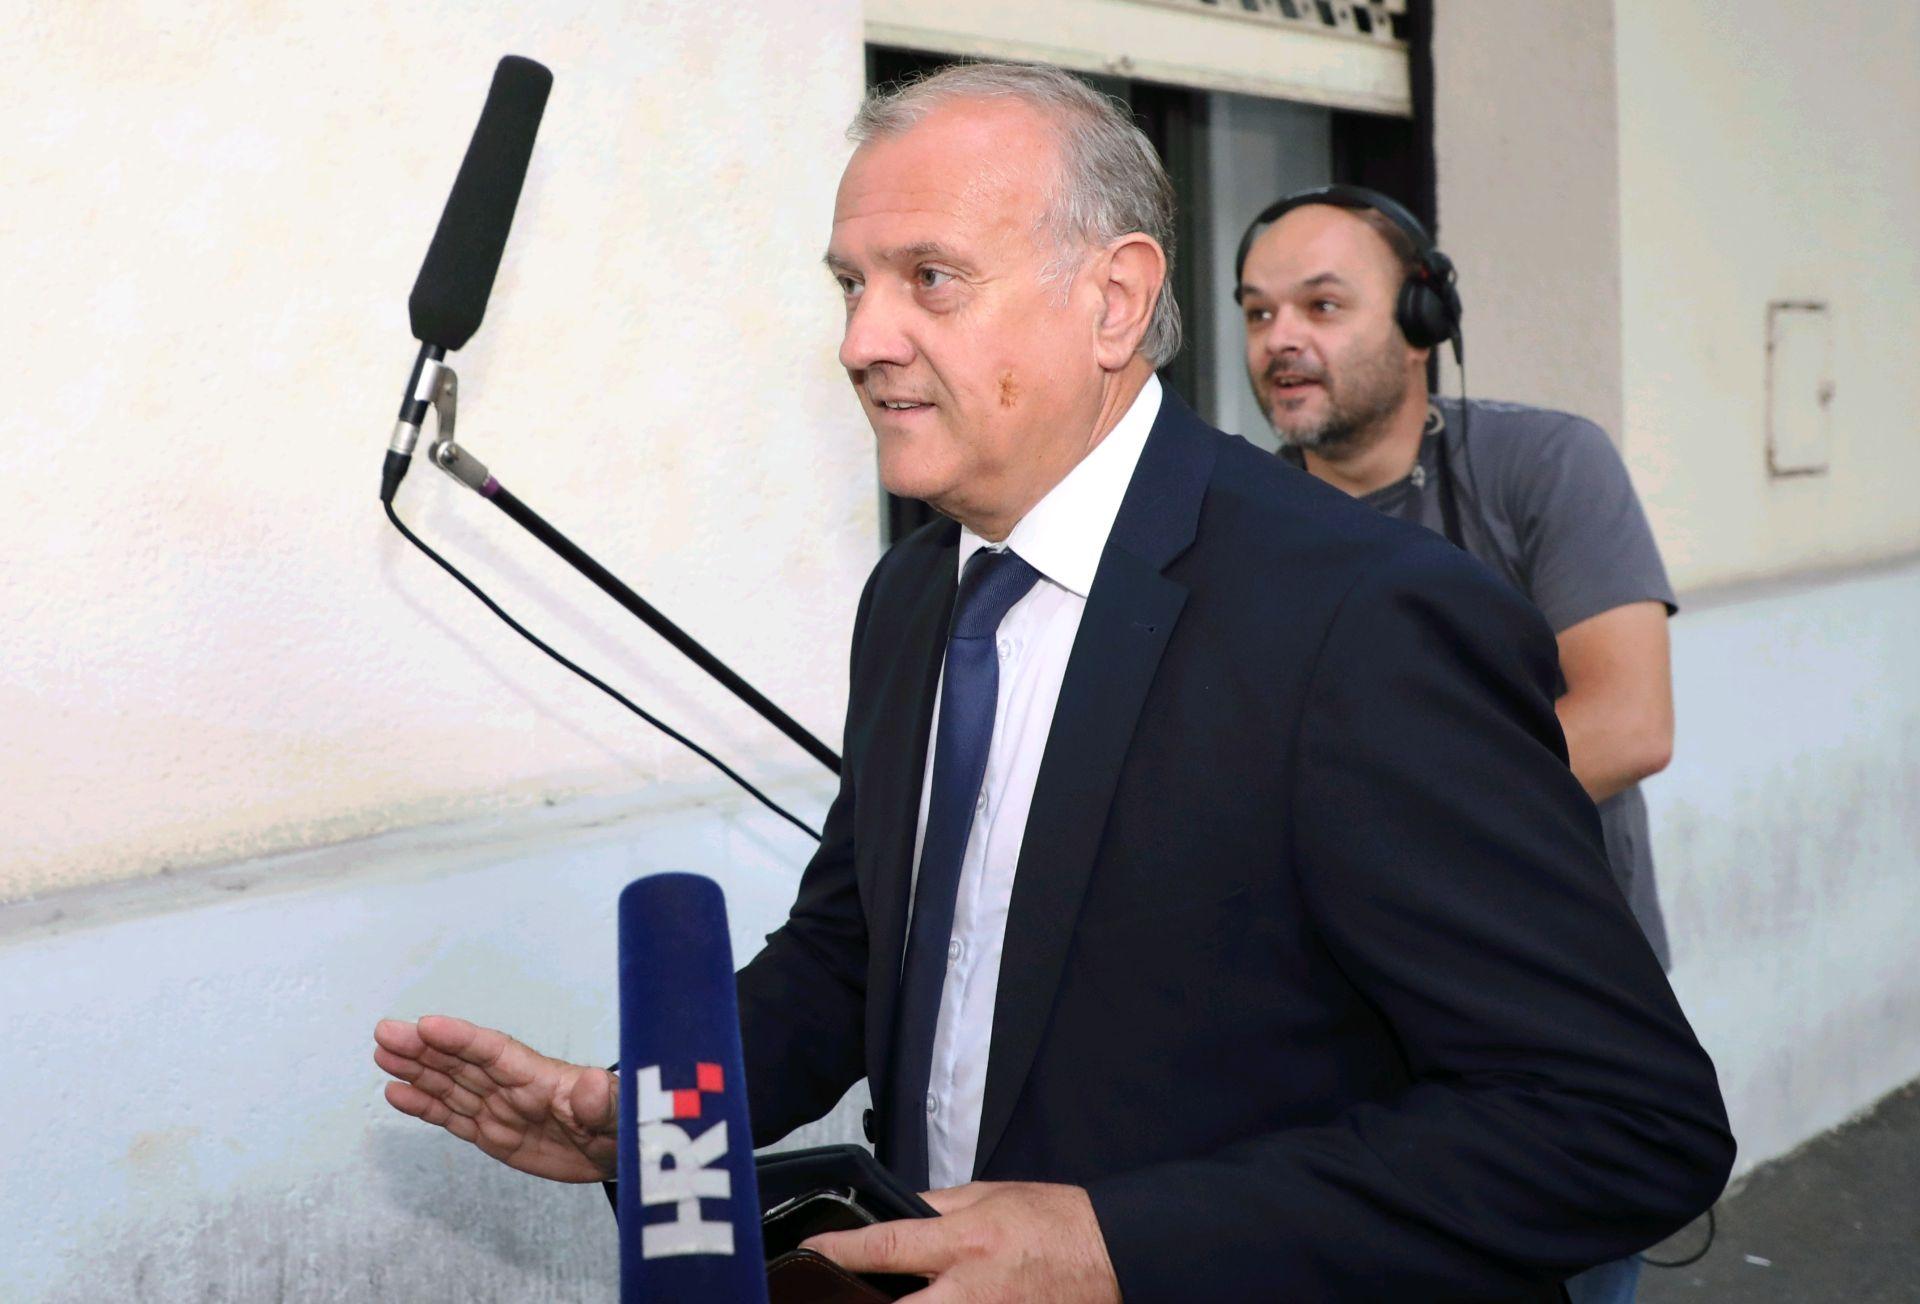 Dražen Bošnjaković predložen za ministra pravosuđa